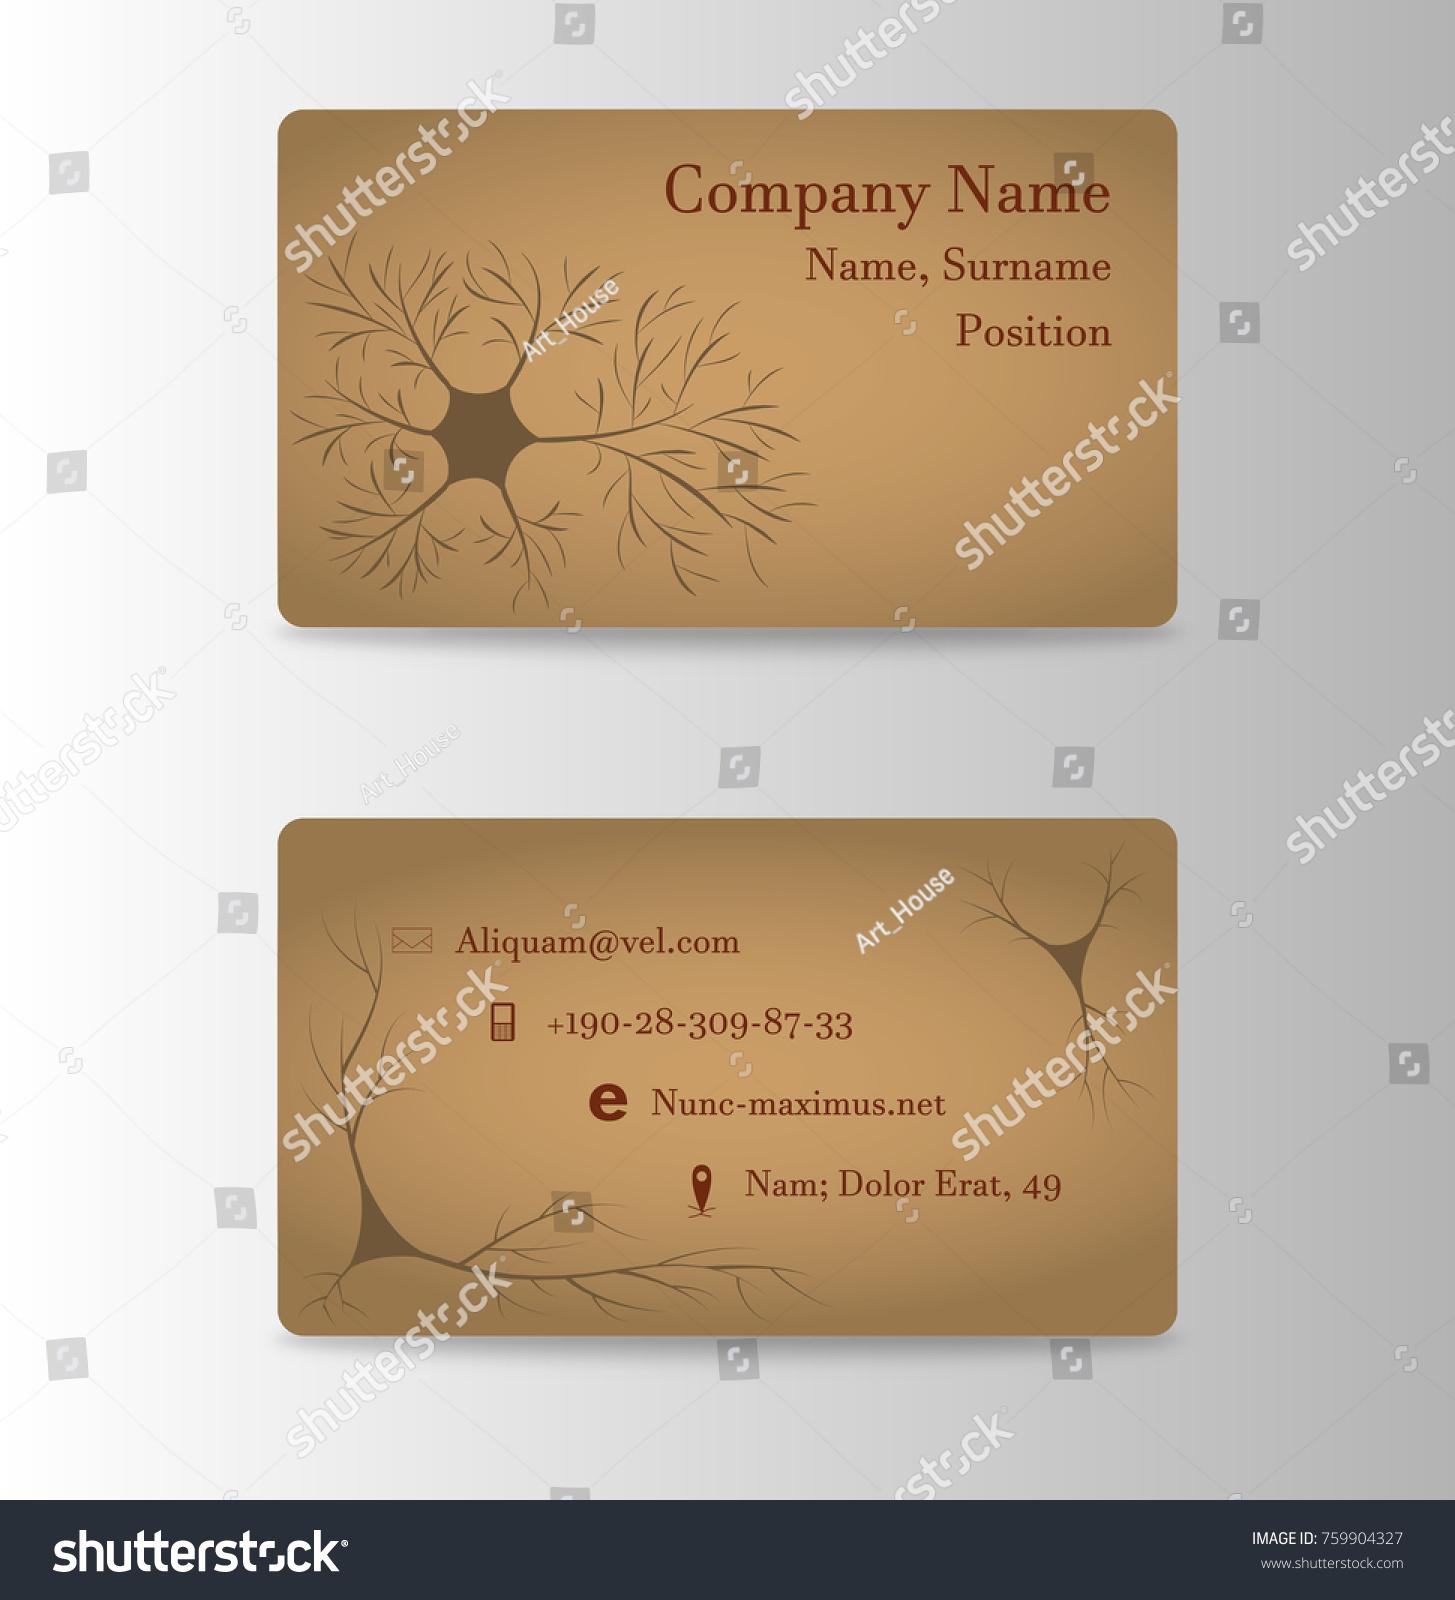 Neurosurgeon brain doctor business card stock vector 759904327 neurosurgeon or brain doctor business card magicingreecefo Images